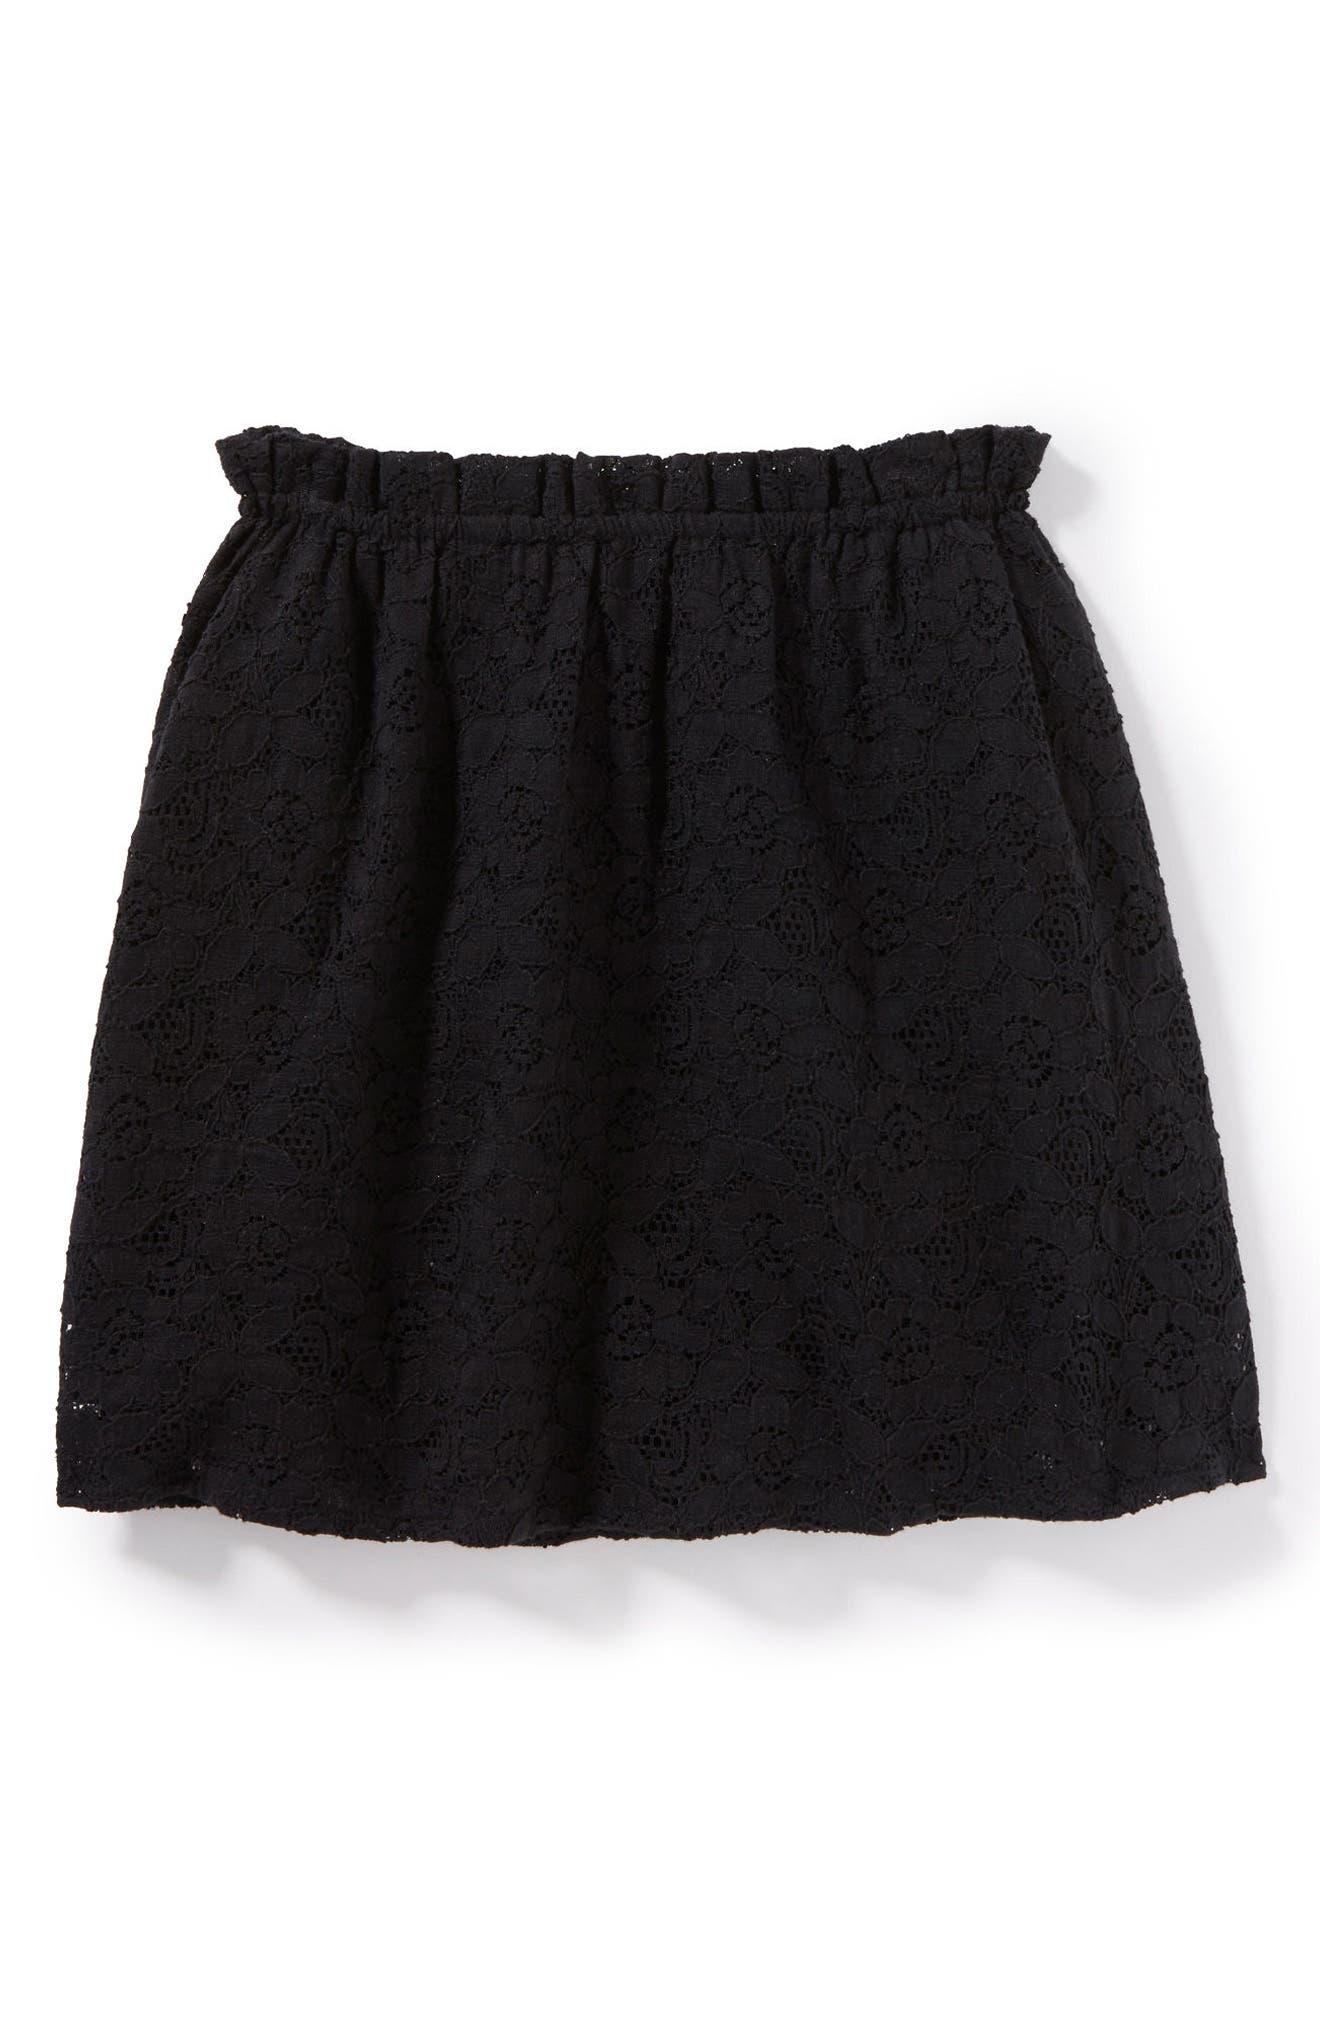 Renee Lace Skirt,                         Main,                         color, Black